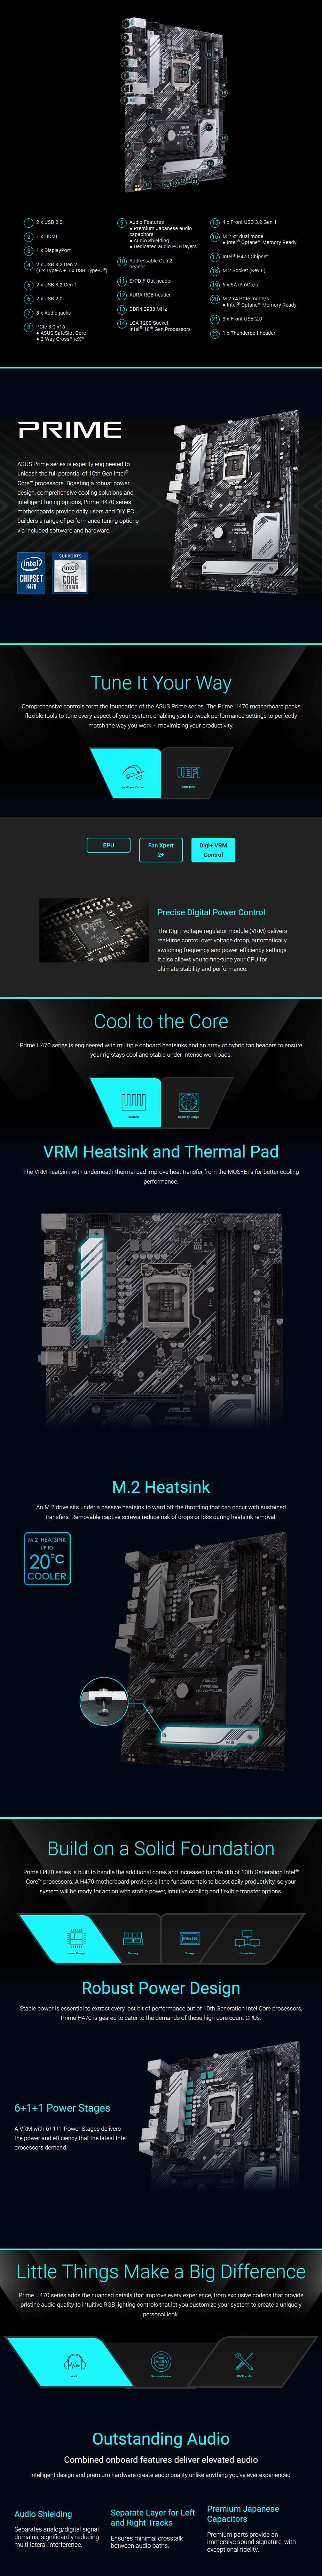 ASUS PRIME H470-PLUS LGA 1200 ATX Motherboard - Overview 1